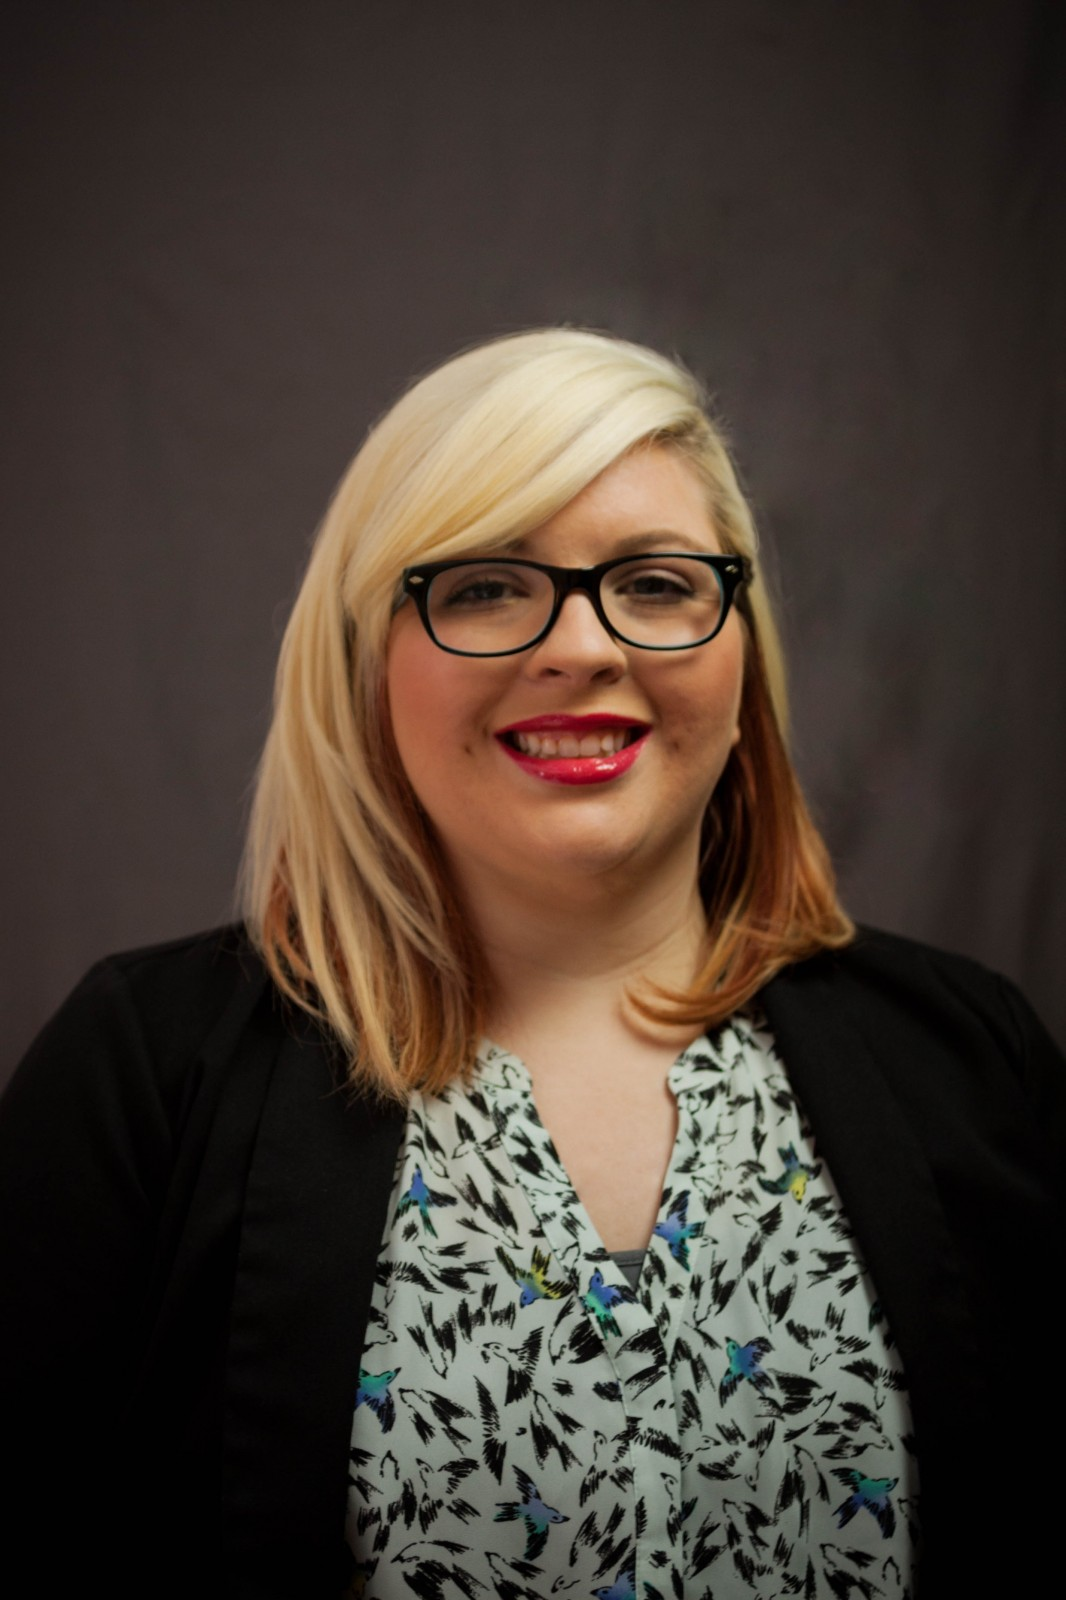 Clodfelter joins staff of regional community foundation